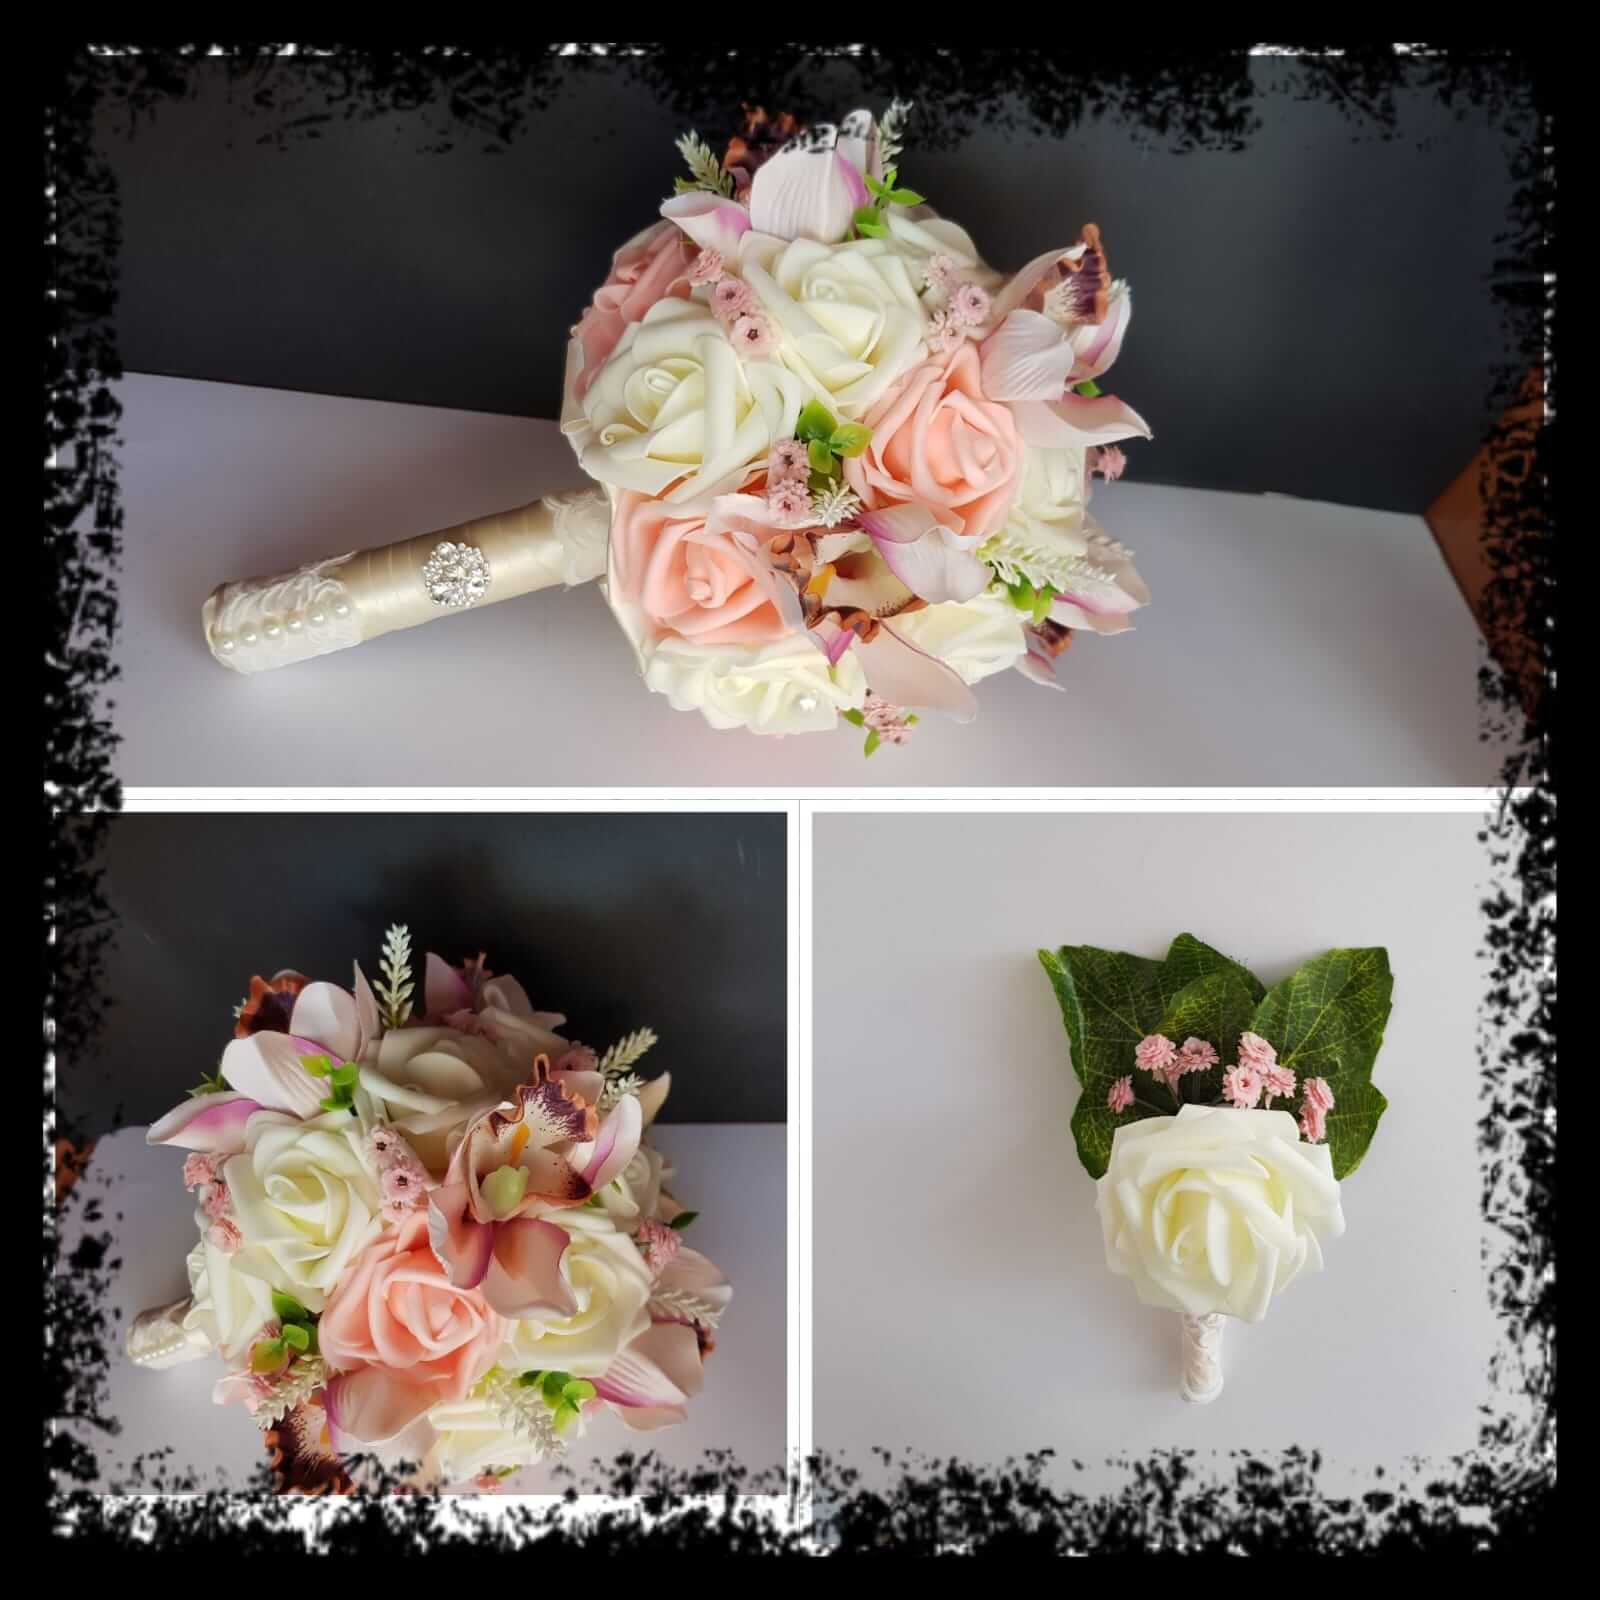 ramo de novia ramo de novia - ramos novia 8 - Ramo de novia